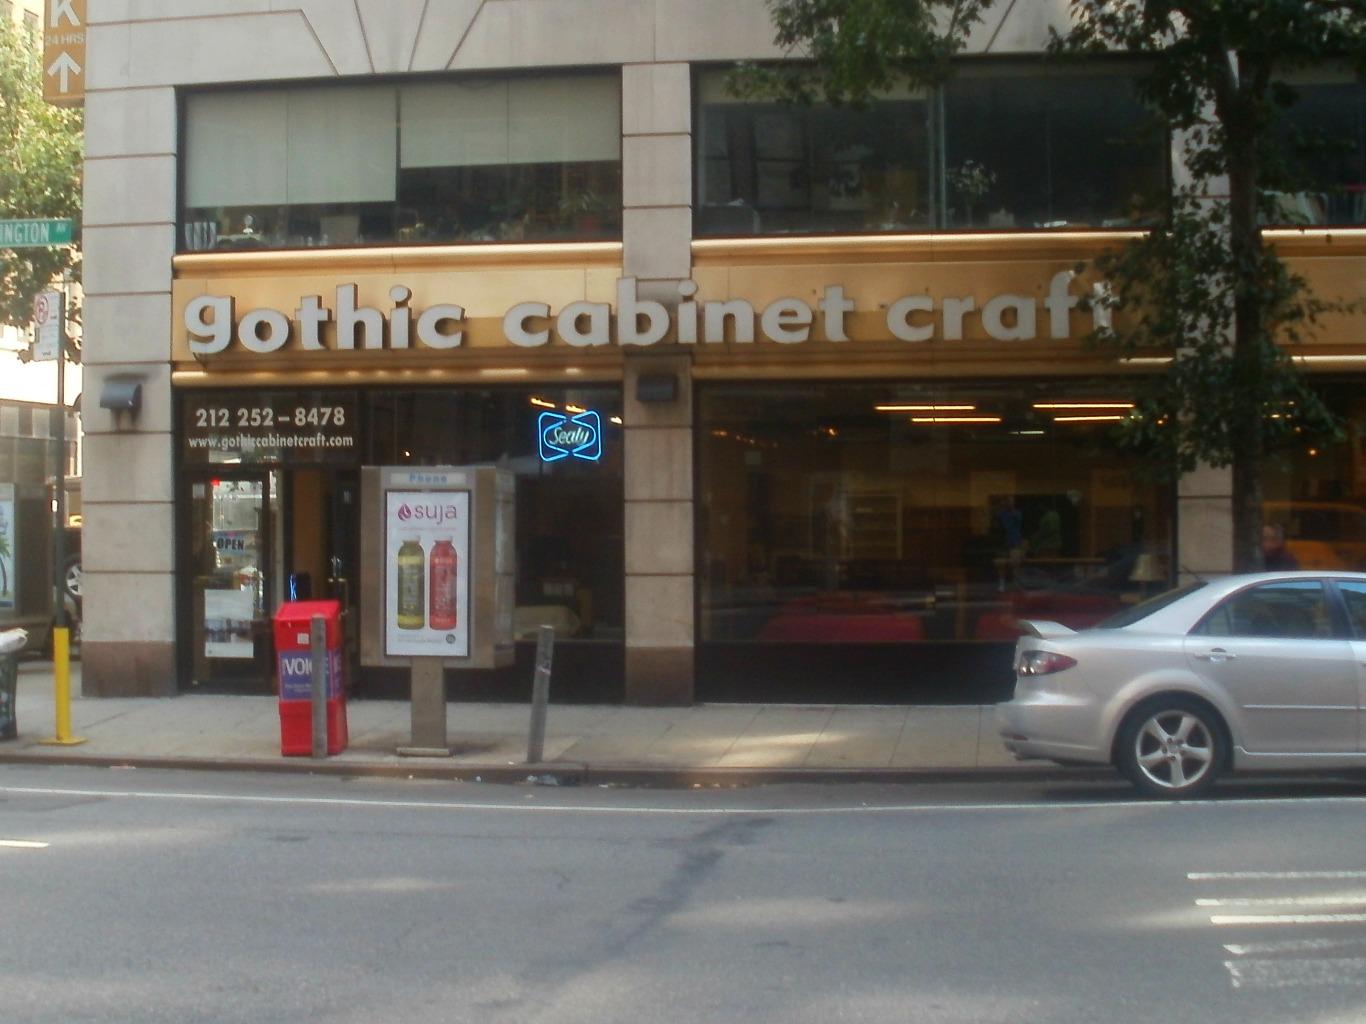 Gothic Cabinent Crafts